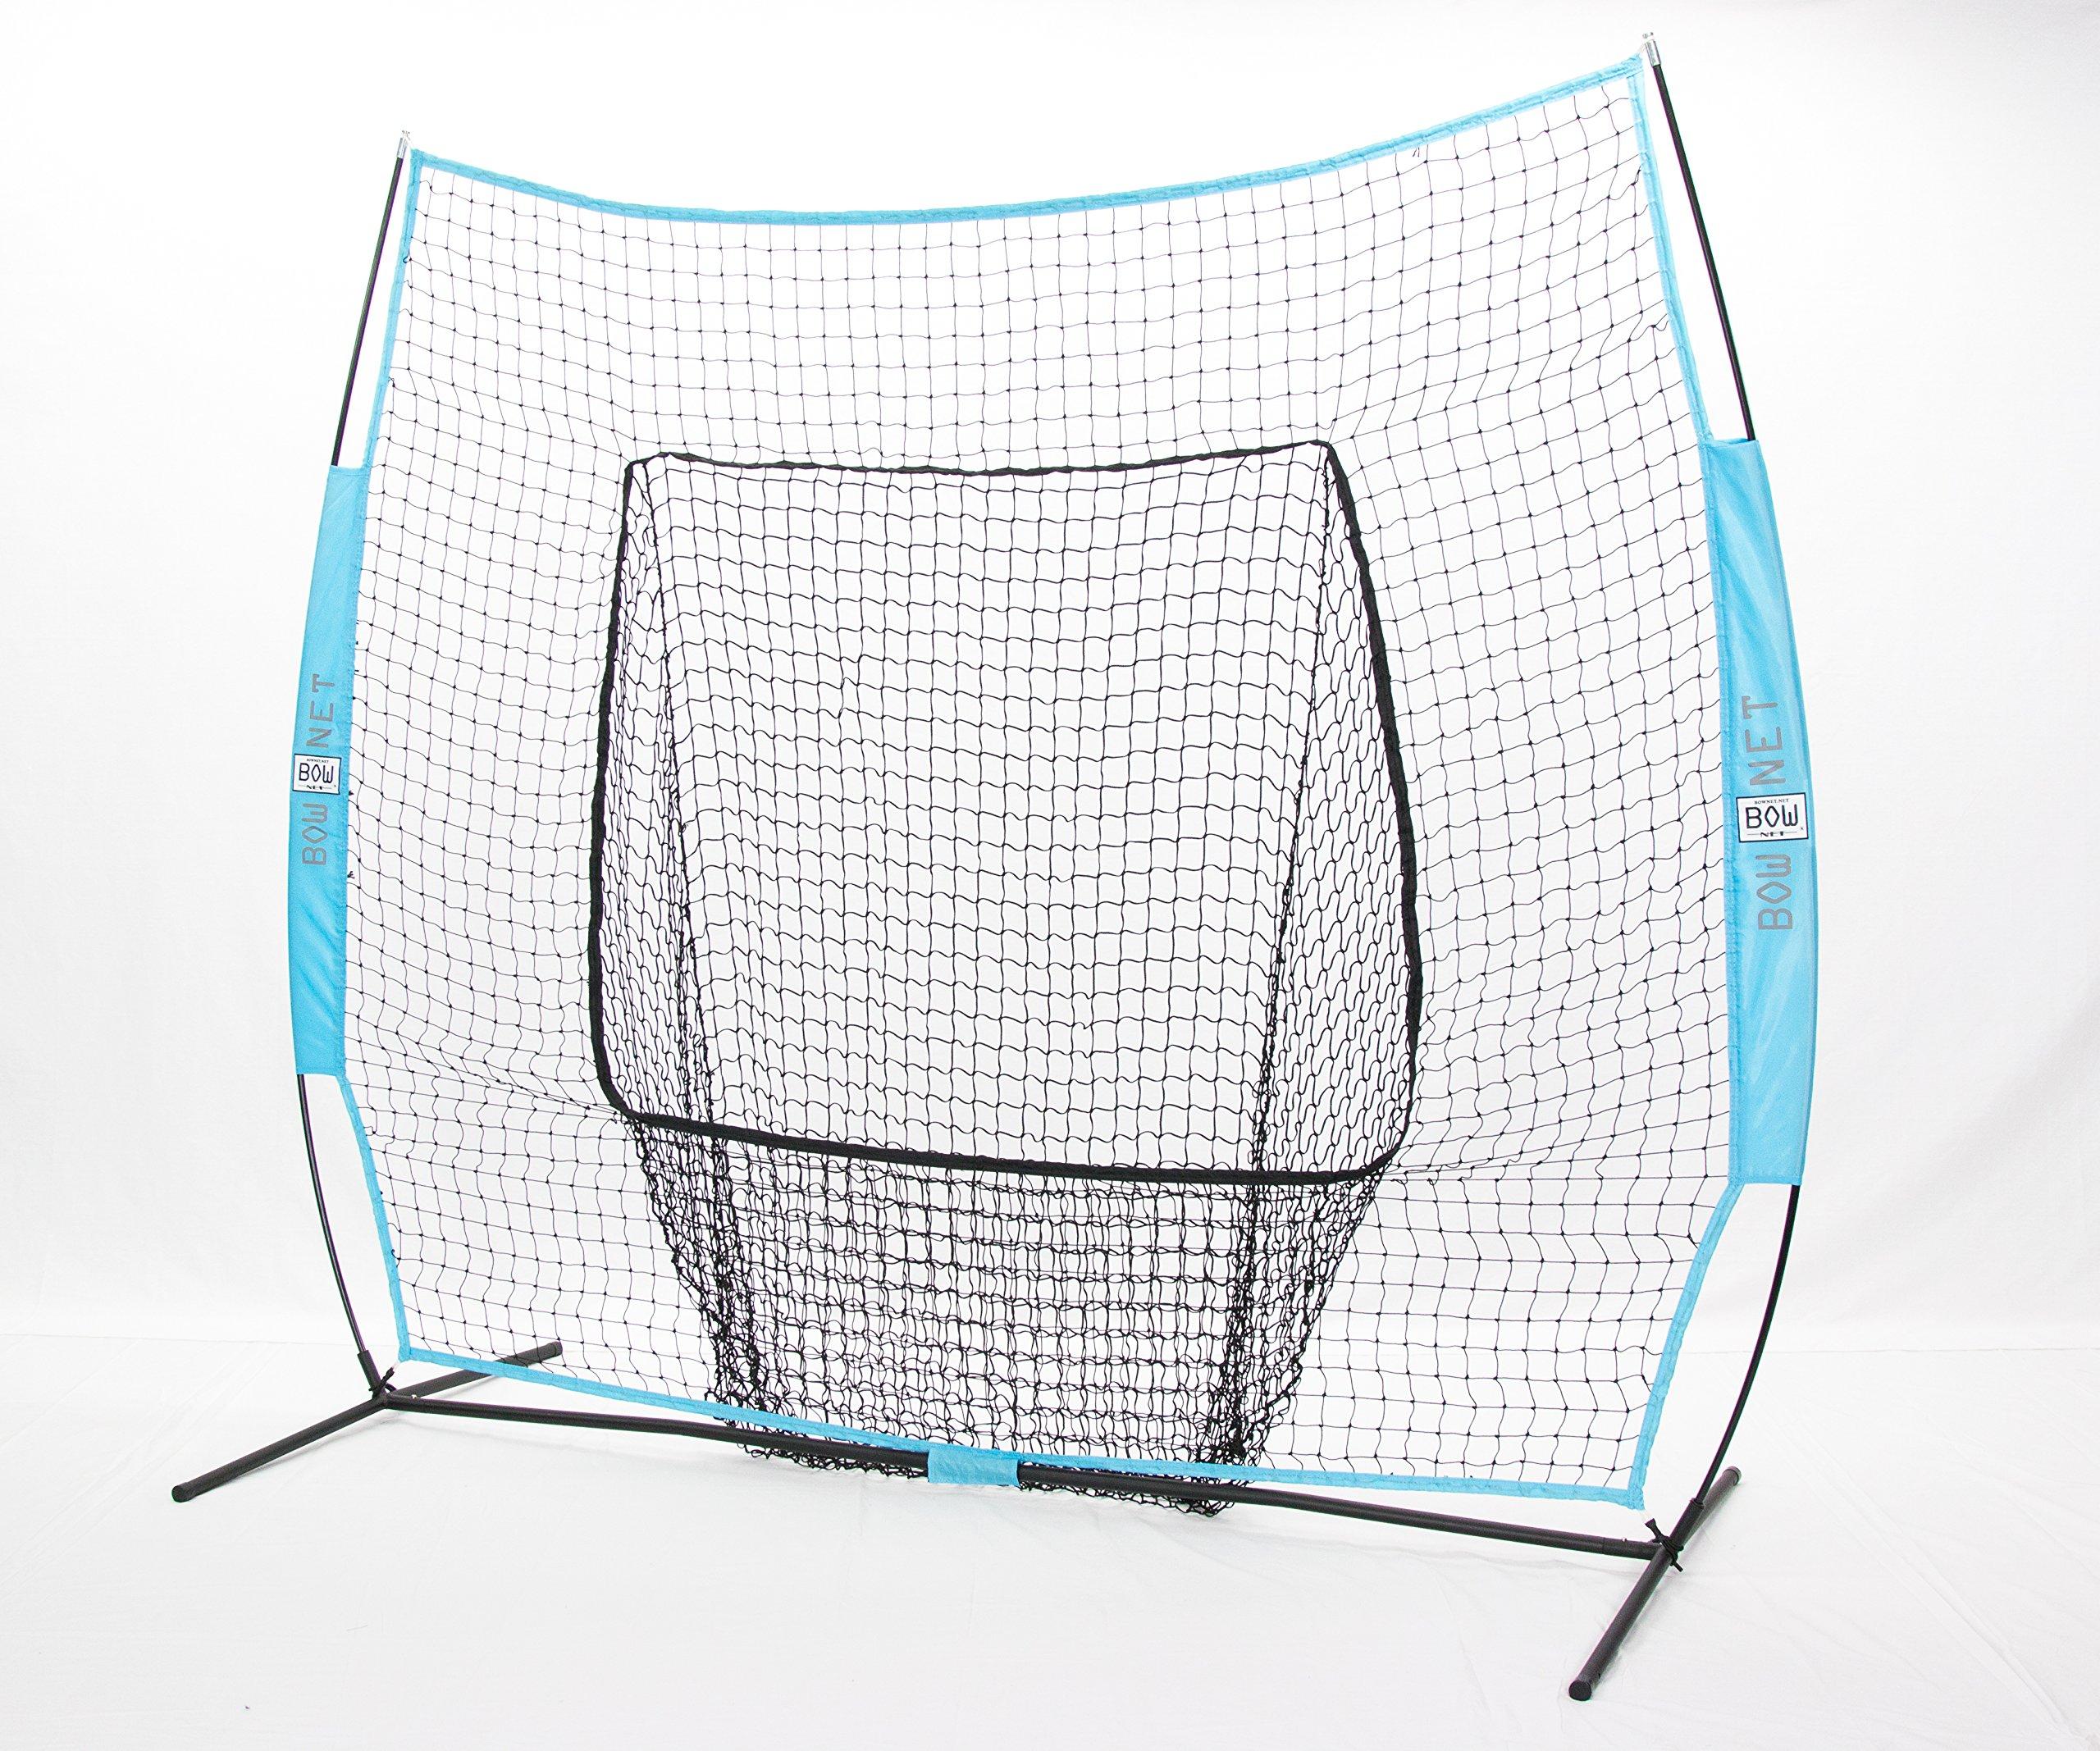 Bownet Big Mouth Portable Baseball/ Softball frame w/ Columbia Blue Net by USABatting (Image #1)